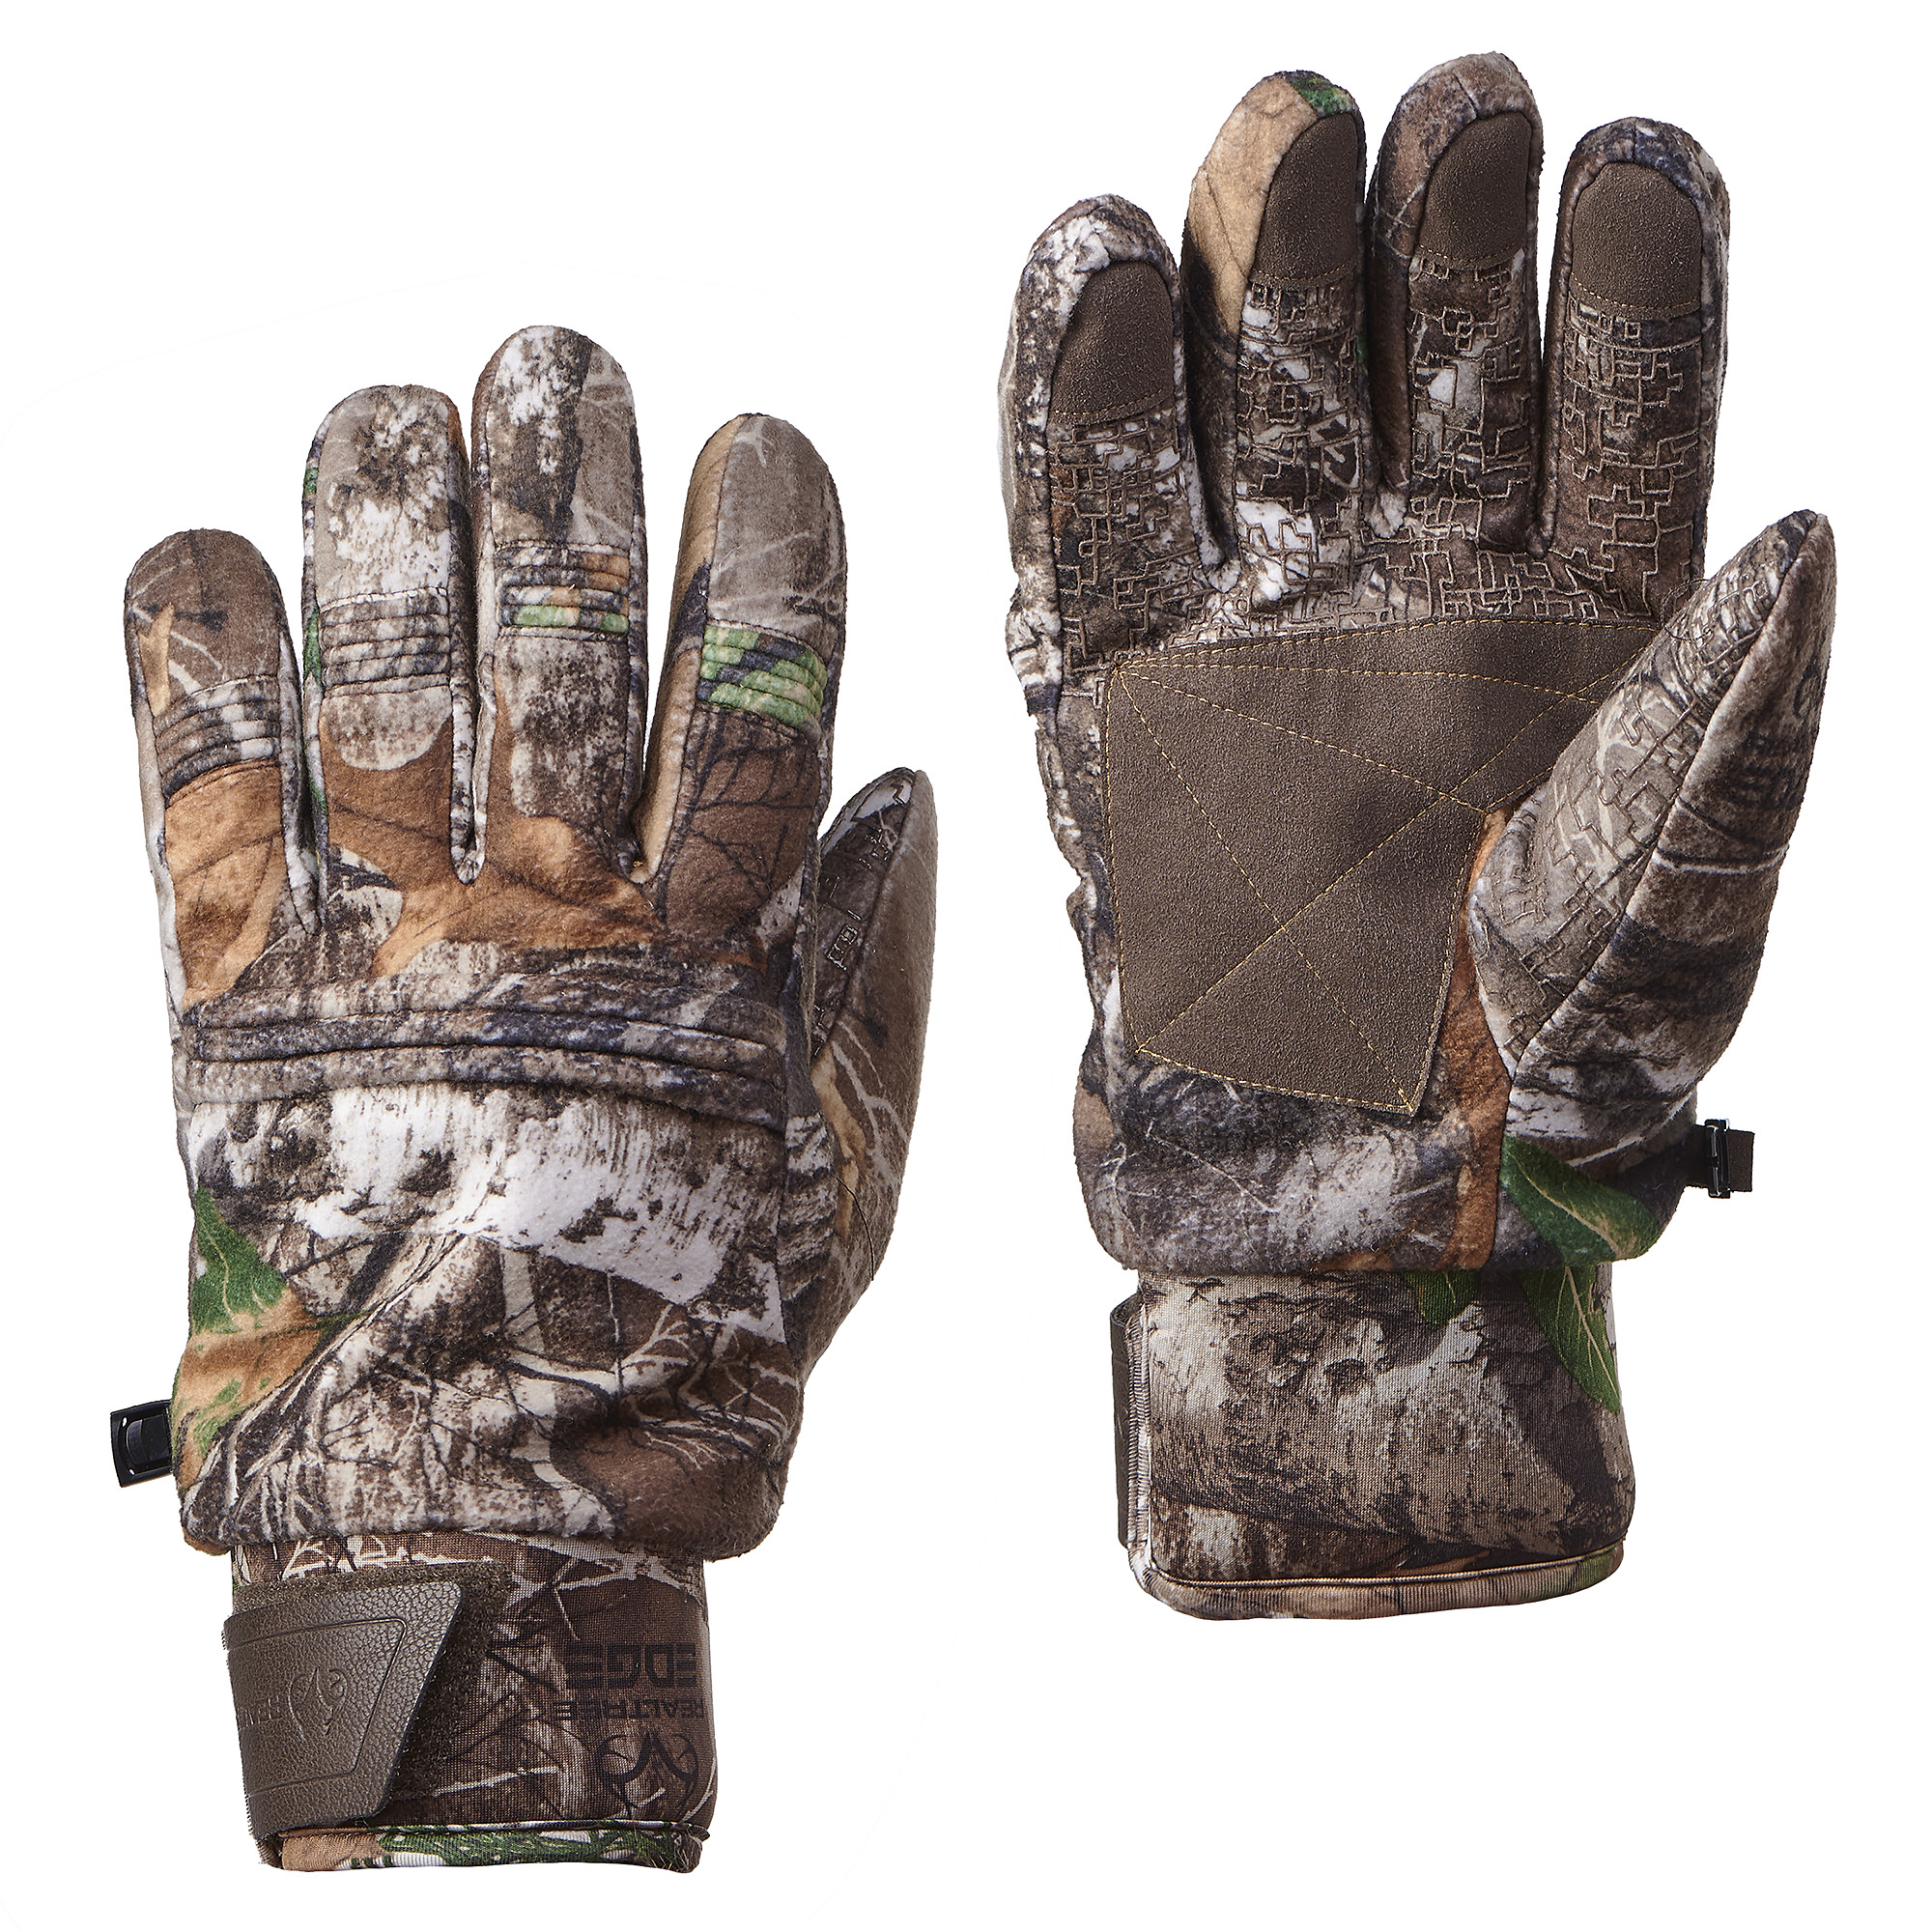 Realtree Edge Men's Heavy Weight Gloves